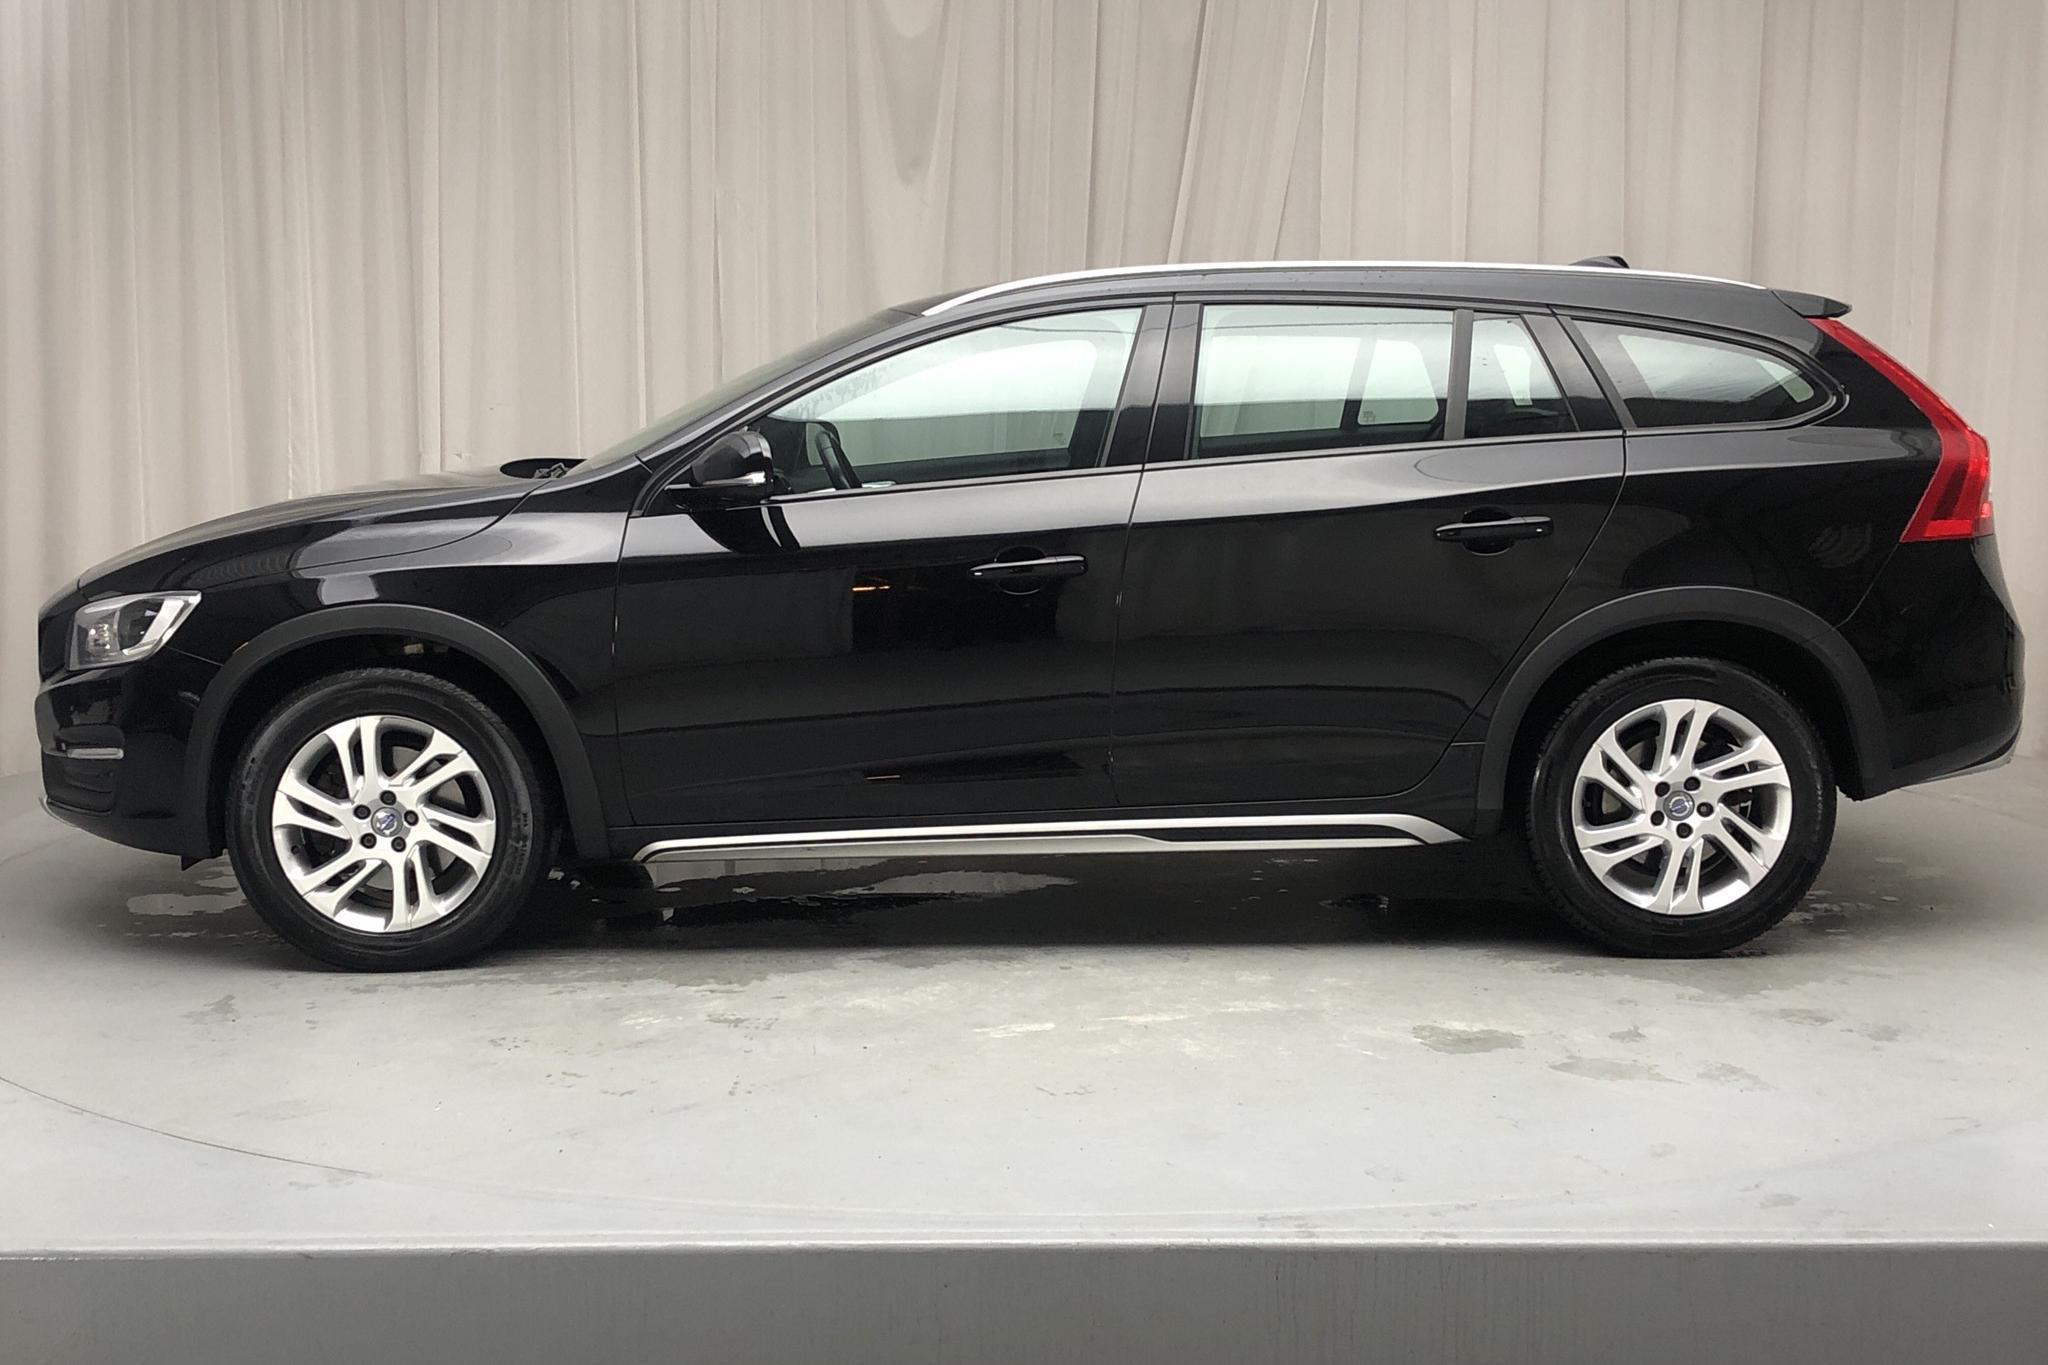 Volvo V60 D4 Cross Country AWD (190hk) - 10 826 mil - Automat - svart - 2018